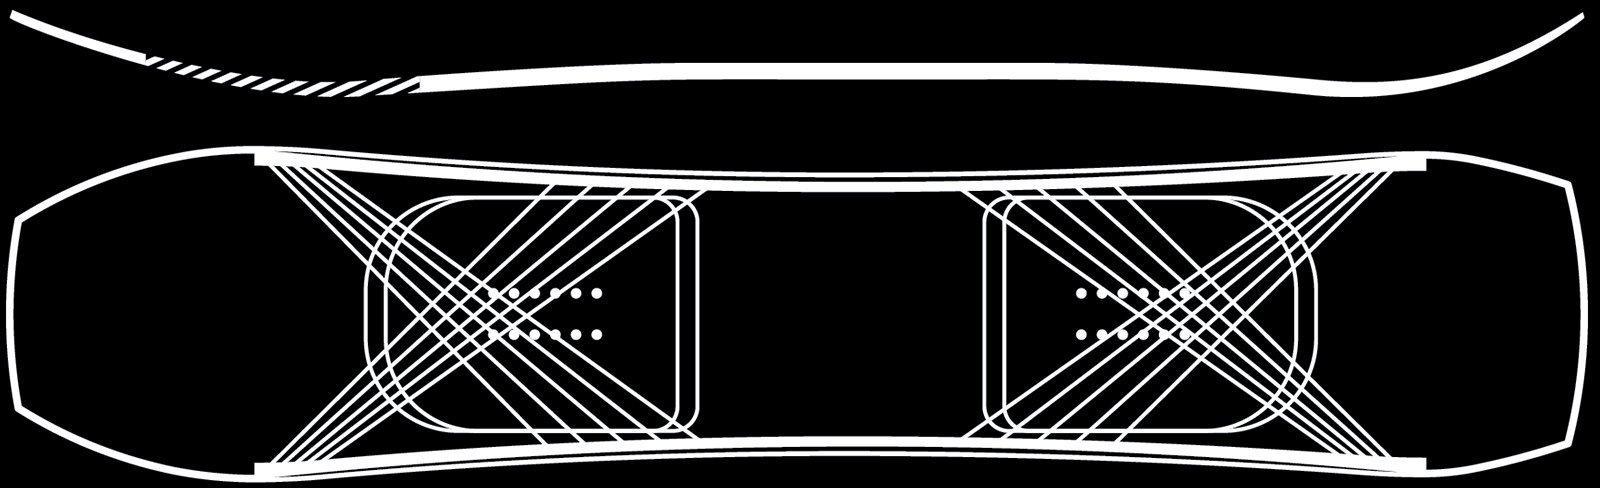 ride_2021_pig-series_superpig_shape.png